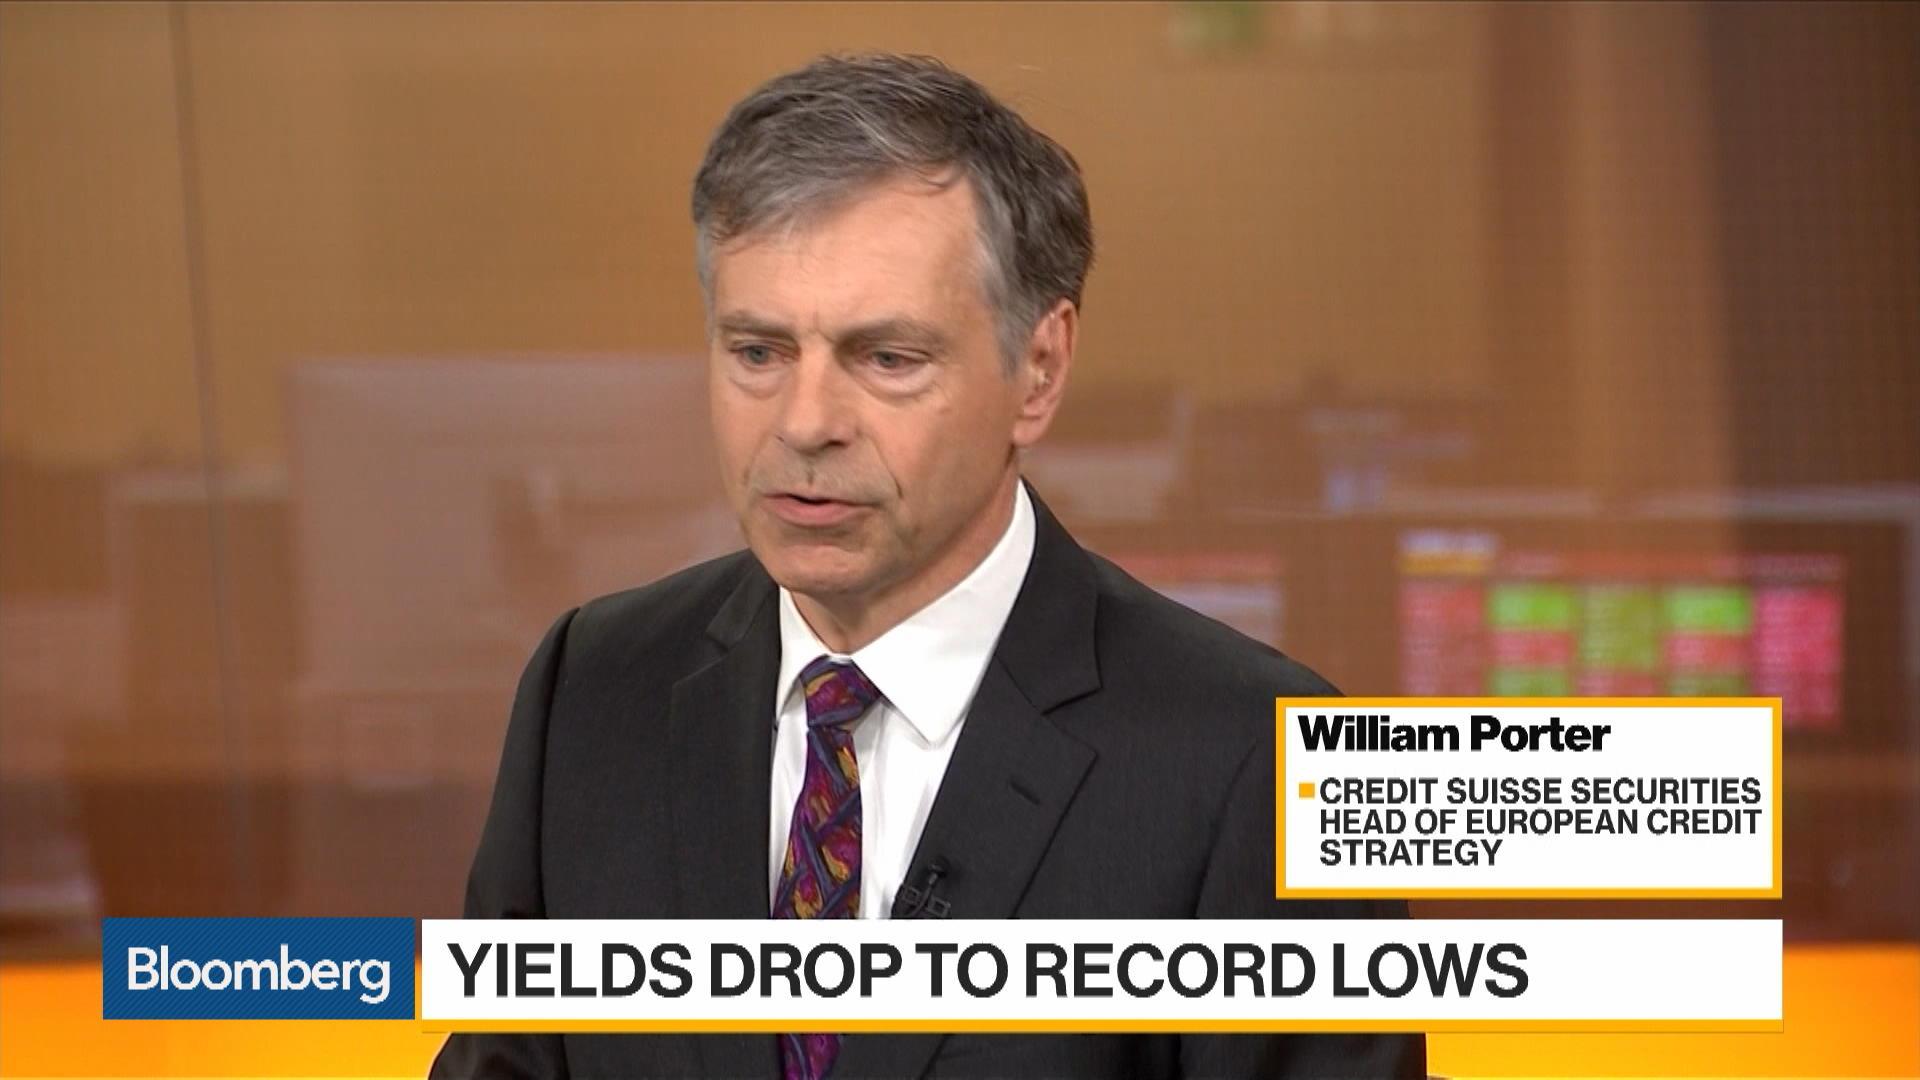 Market Is Back in 'Buy on Dips,' Says Credit Suisse's Porter